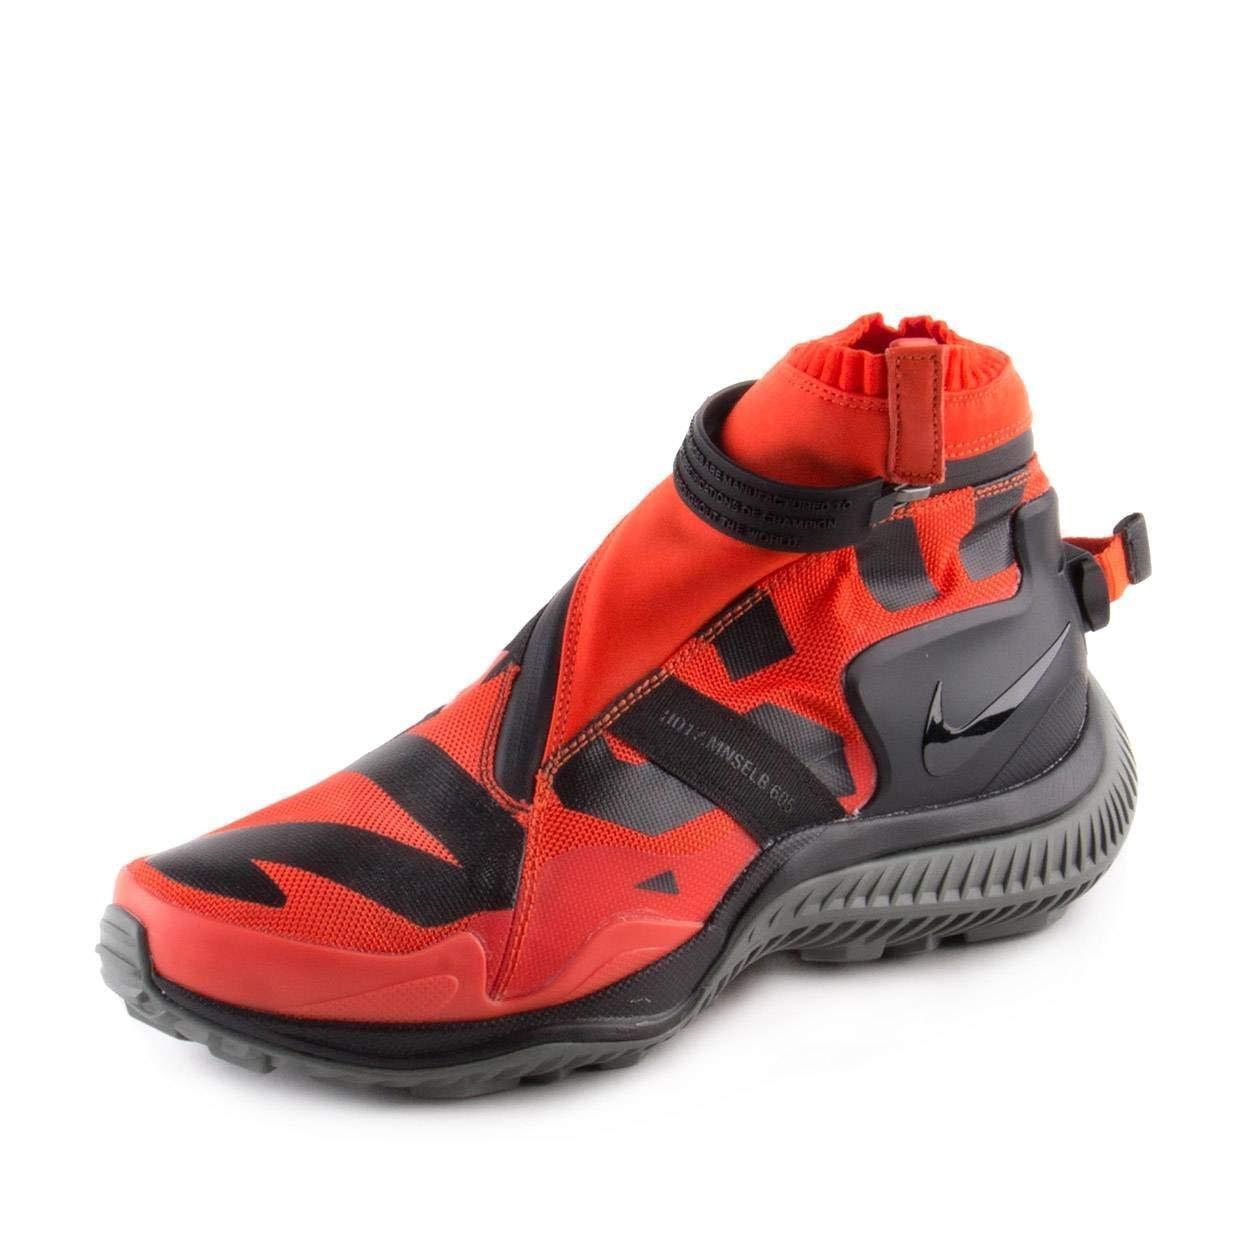 NIKE Mens NSW Gaiter Gyakusou Boot - Size 7.5 (Orange/Black Nylon) AA0530-800